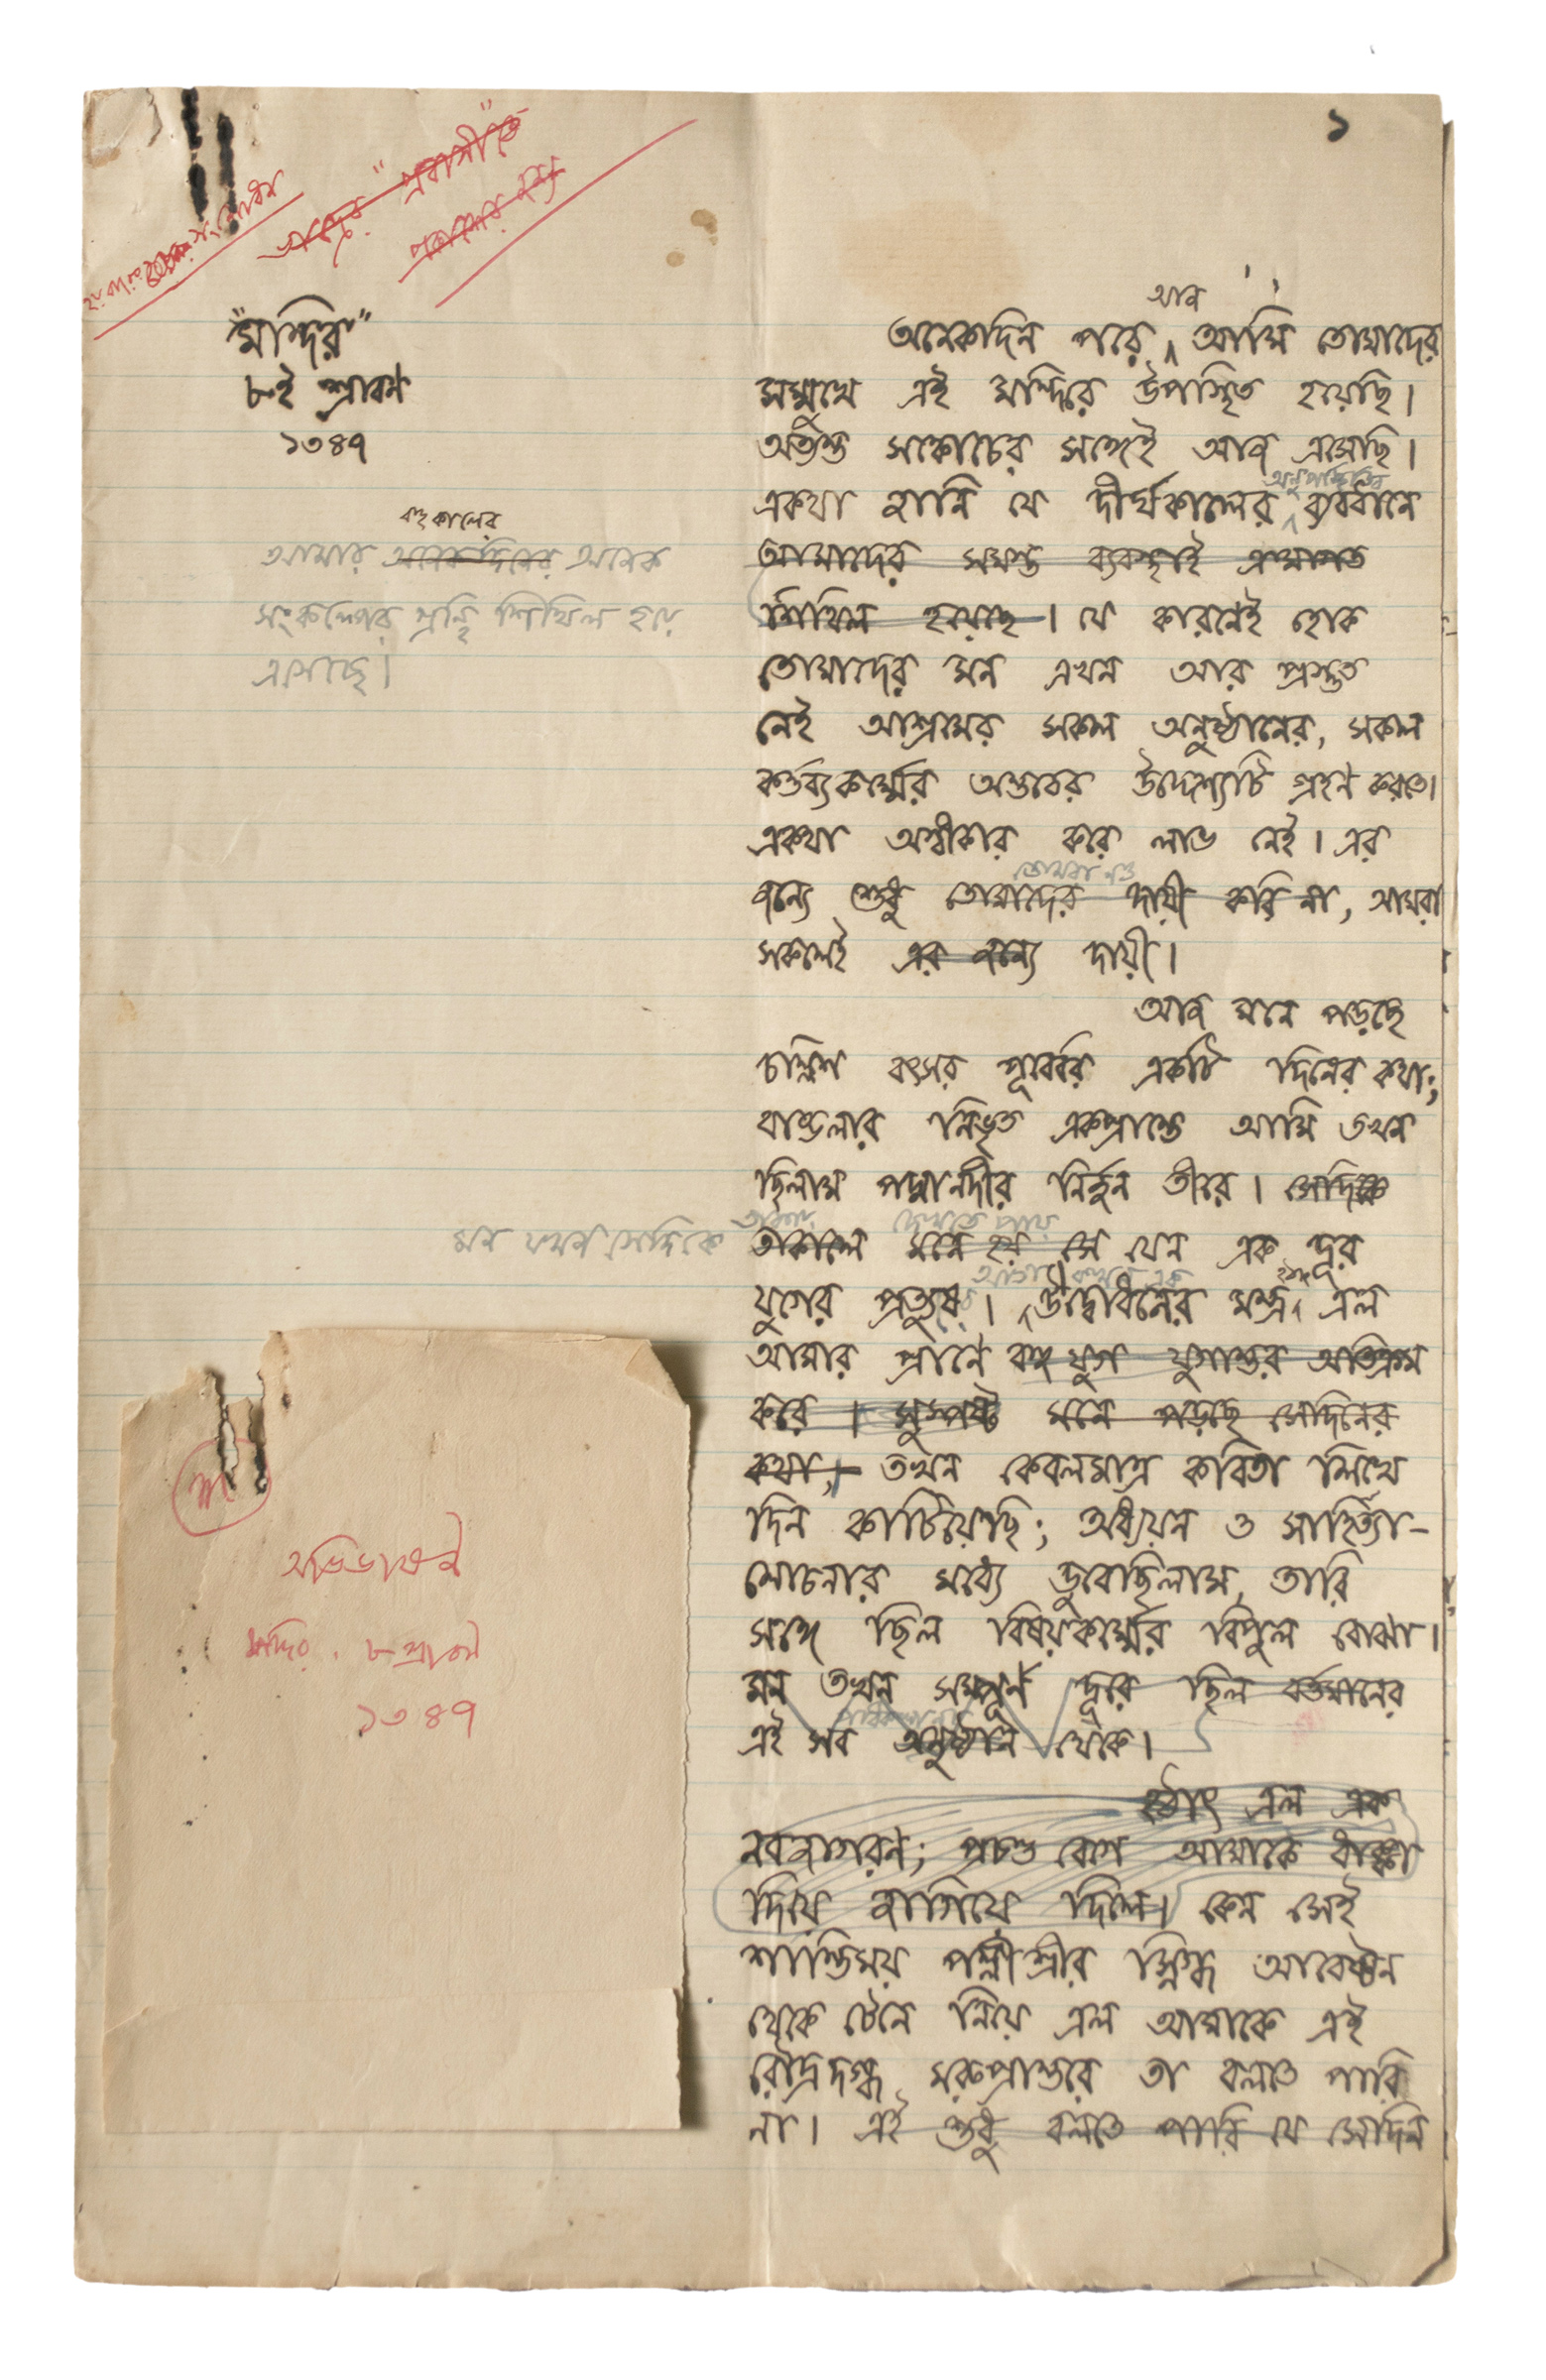 Rabindranath Tagore's speeches: Mandir